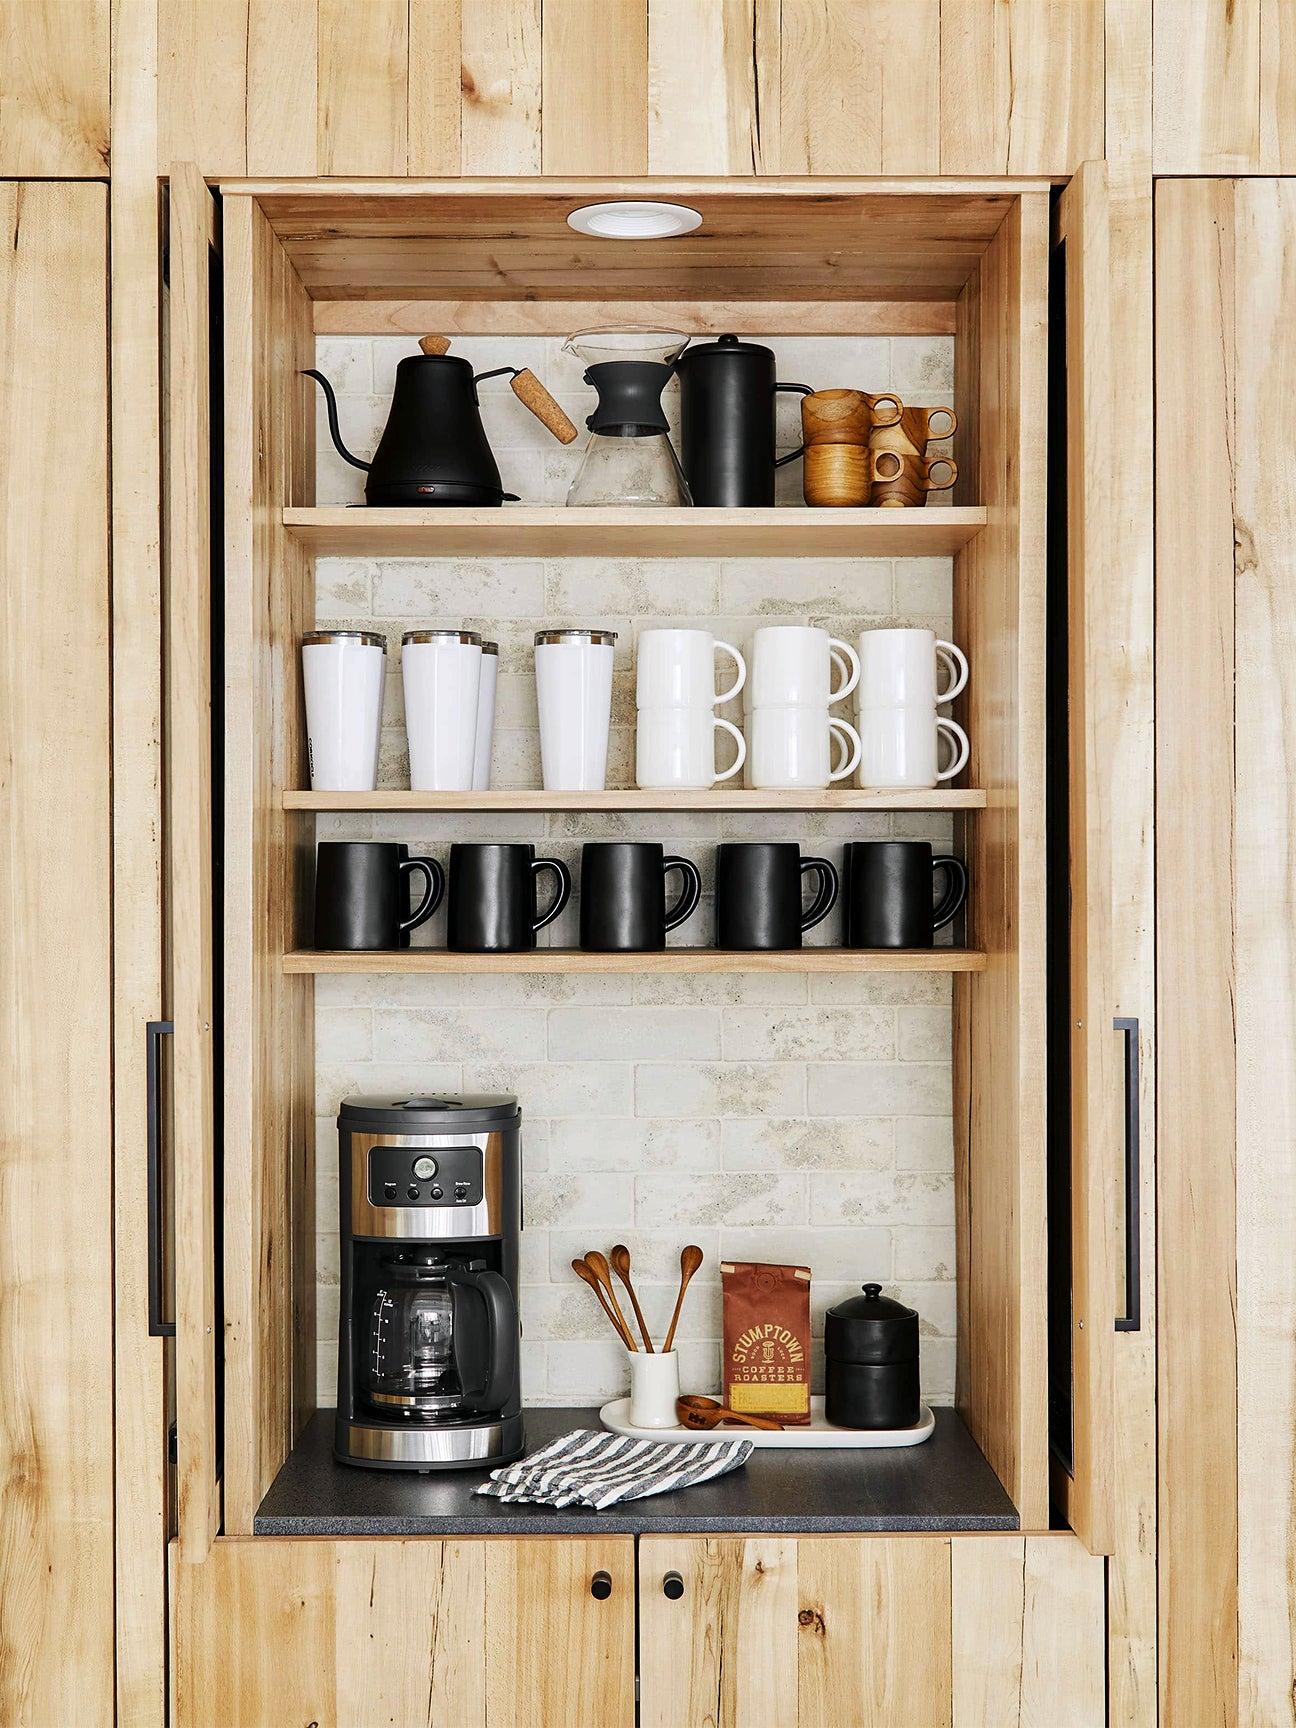 4 Home Coffee Station Ideas To Make